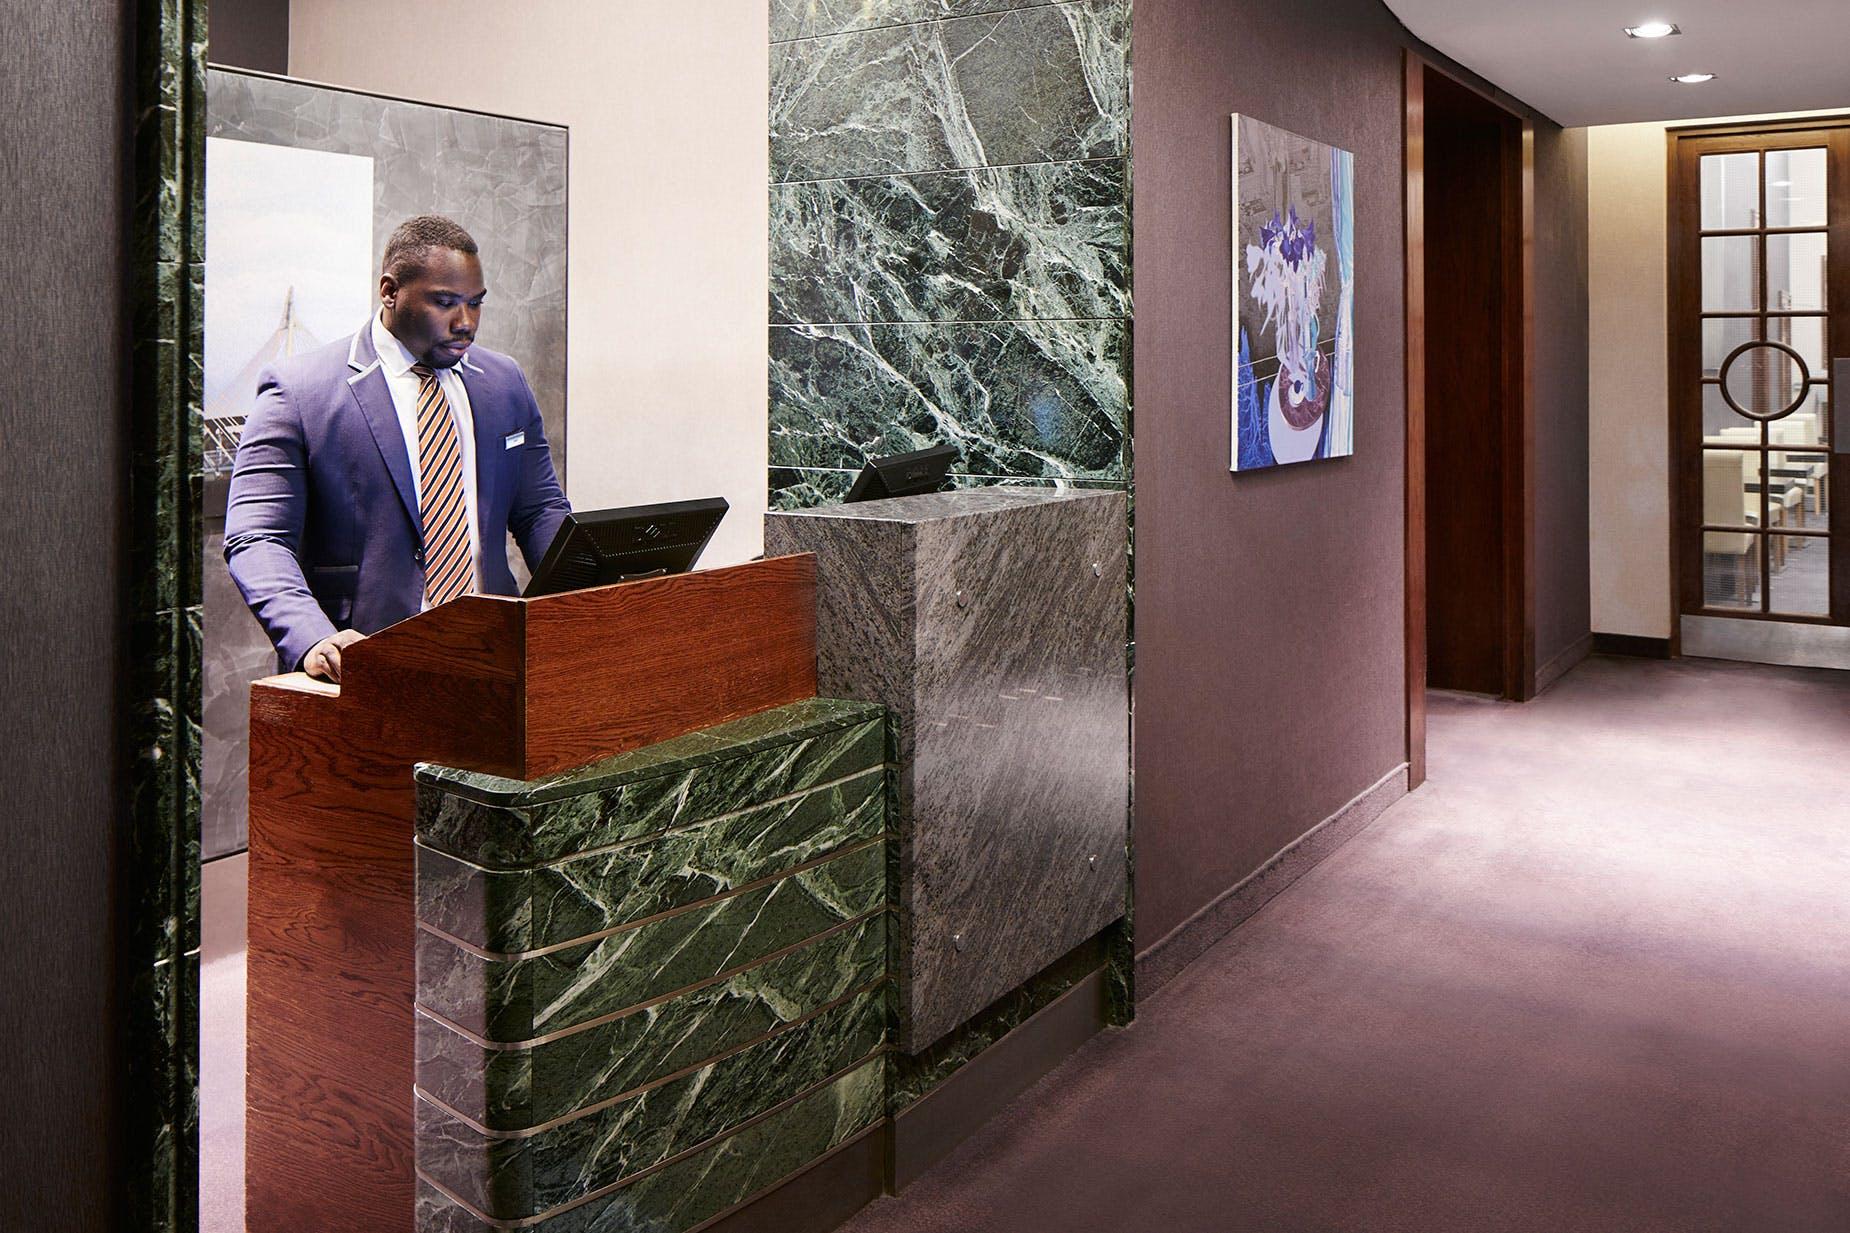 Member Service Desk at Club Quarters Hotel, Trafalgar Square, London